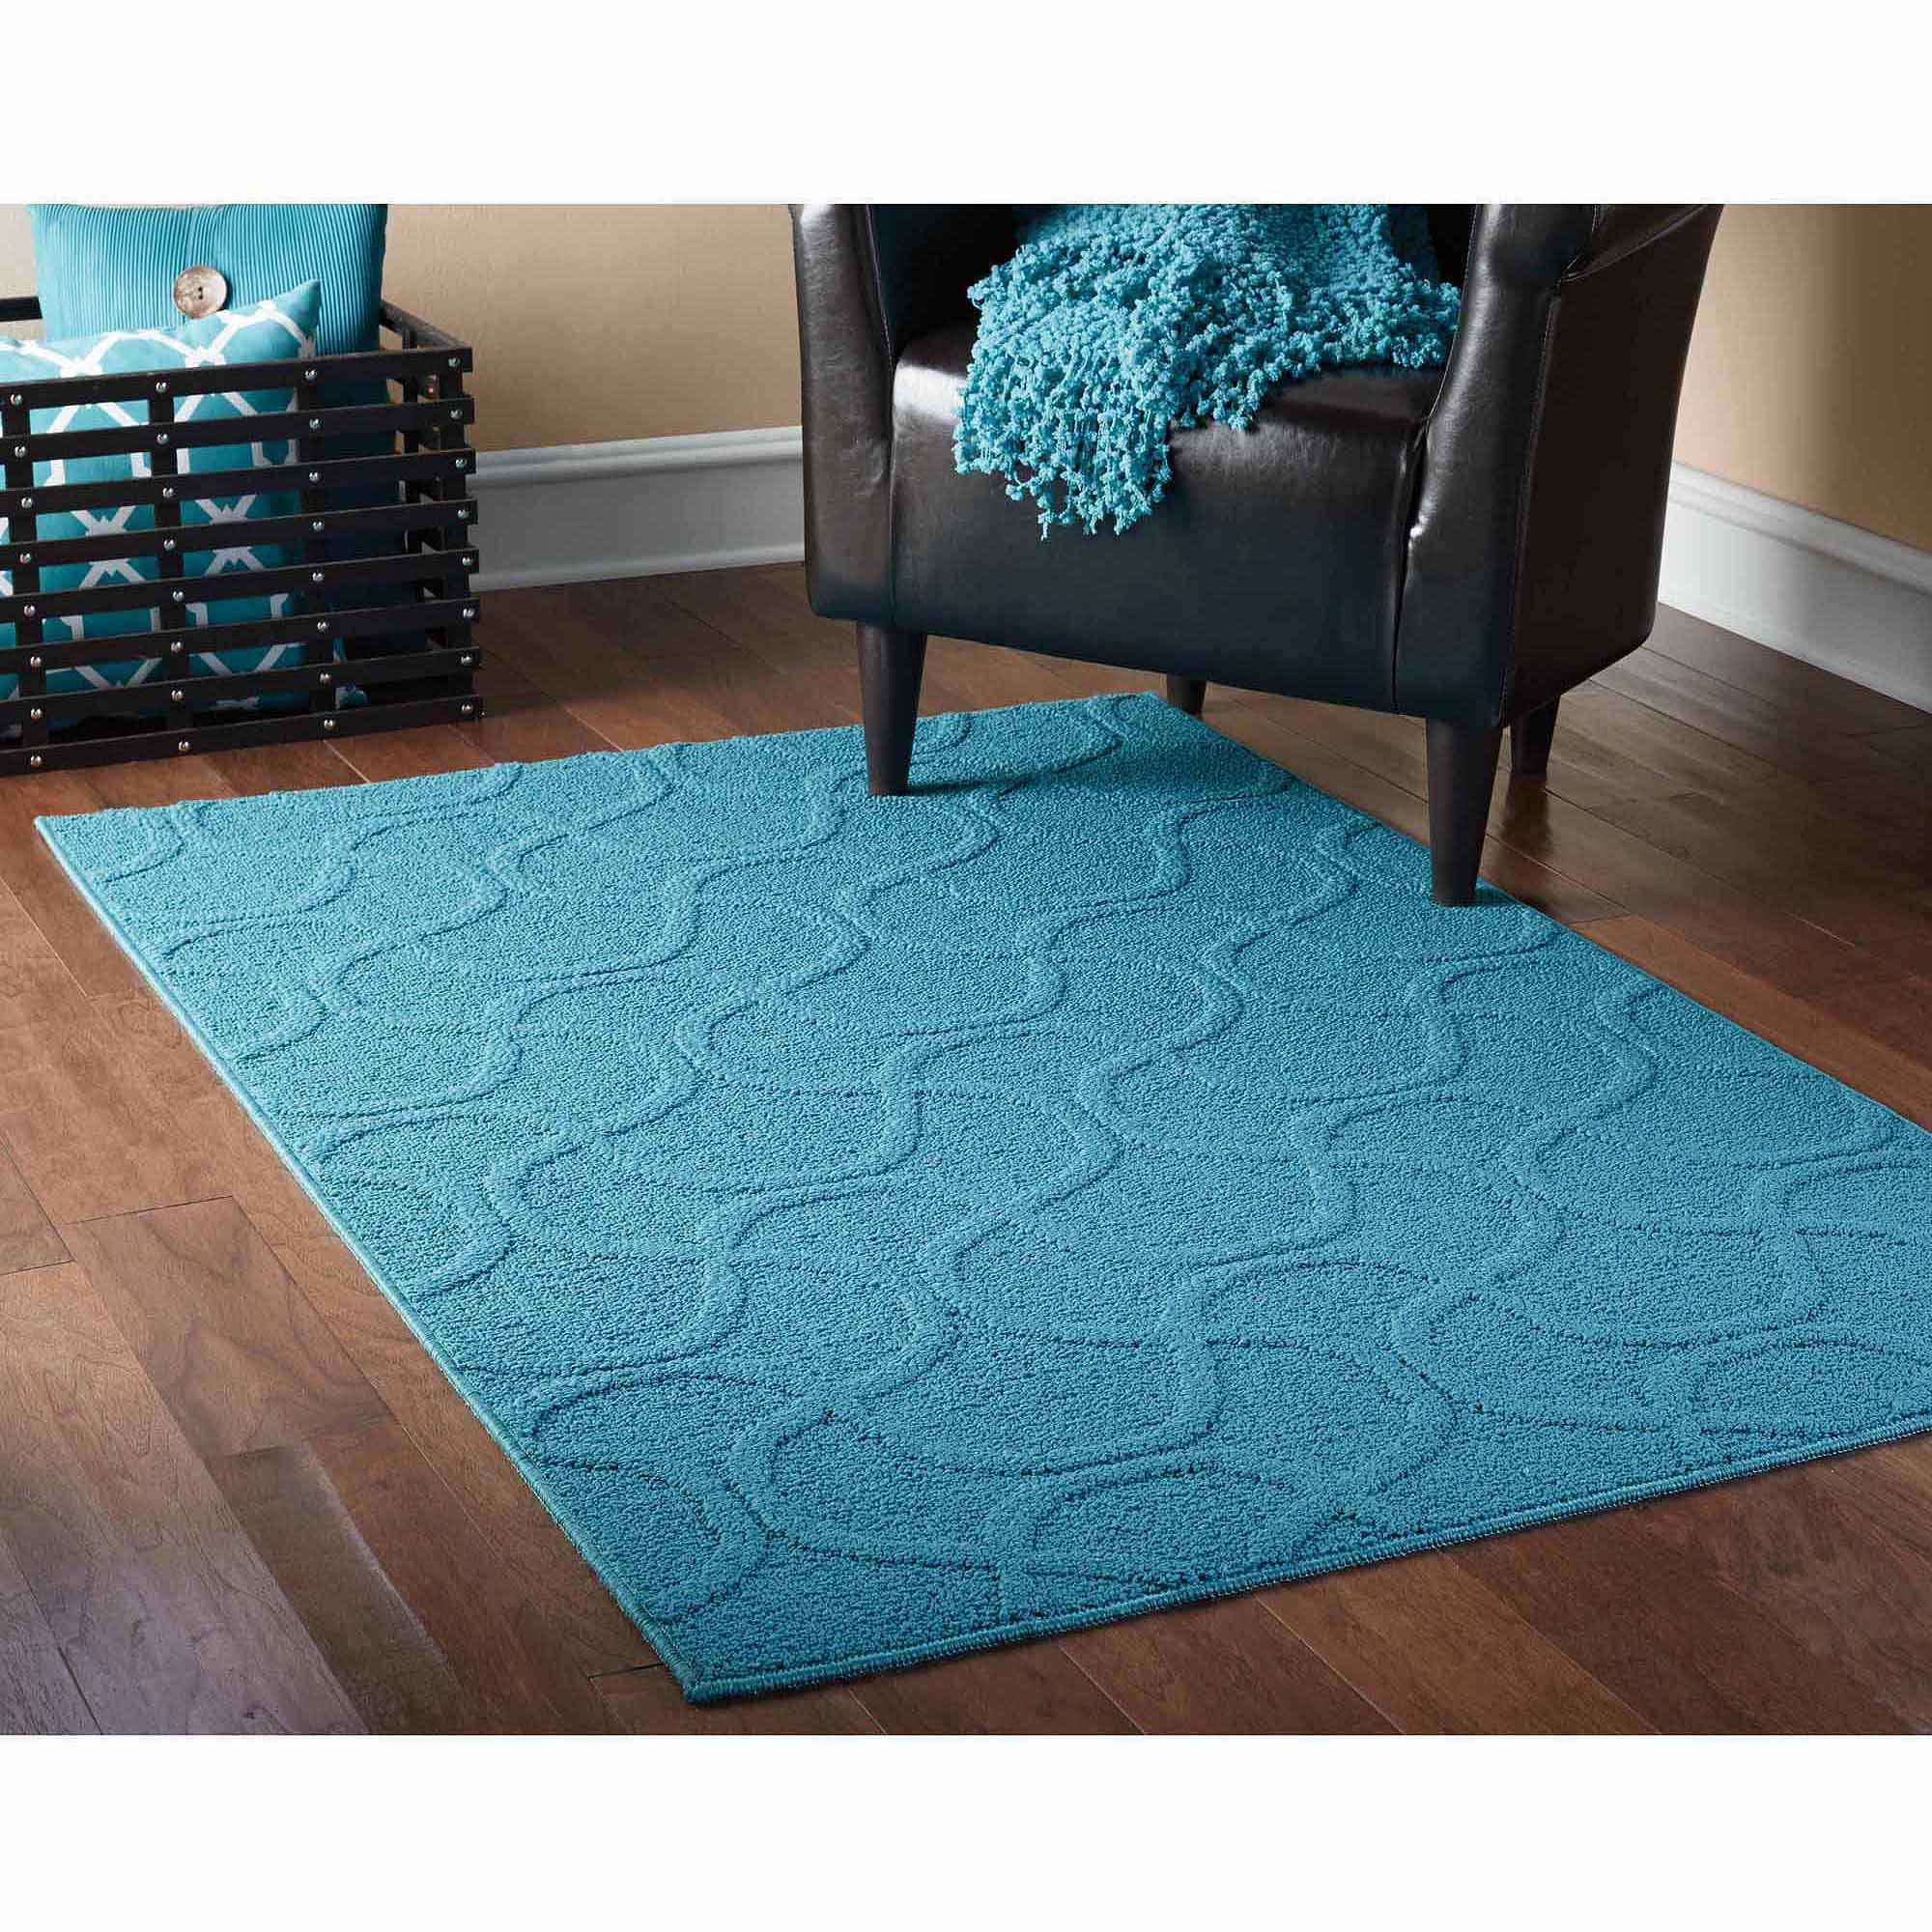 teal rug mainstays drizzle area rug, teal - walmart.com HNHKNTL